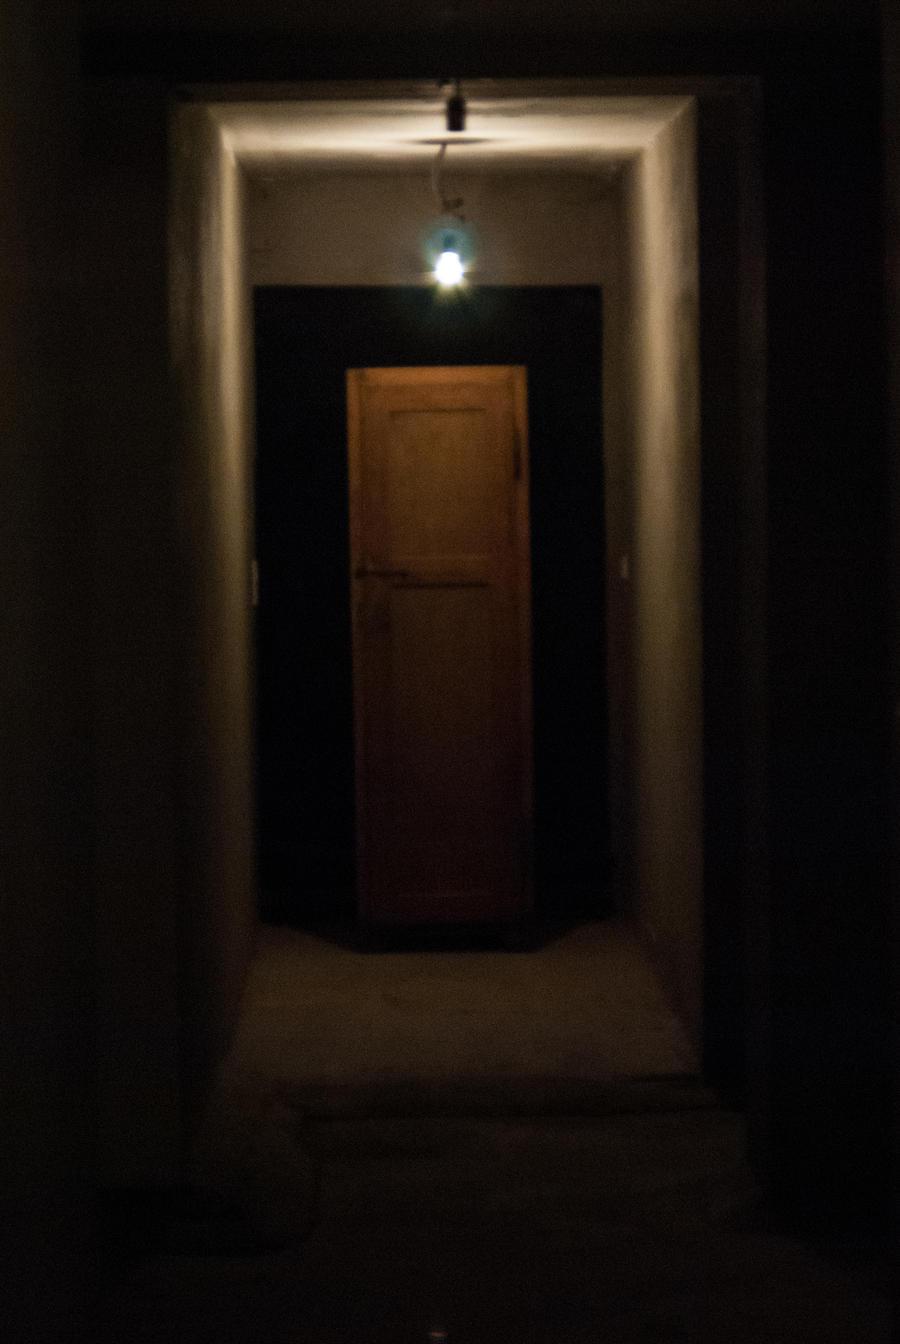 The dark closet by sheynkler87 The dark closet by sheynkler87